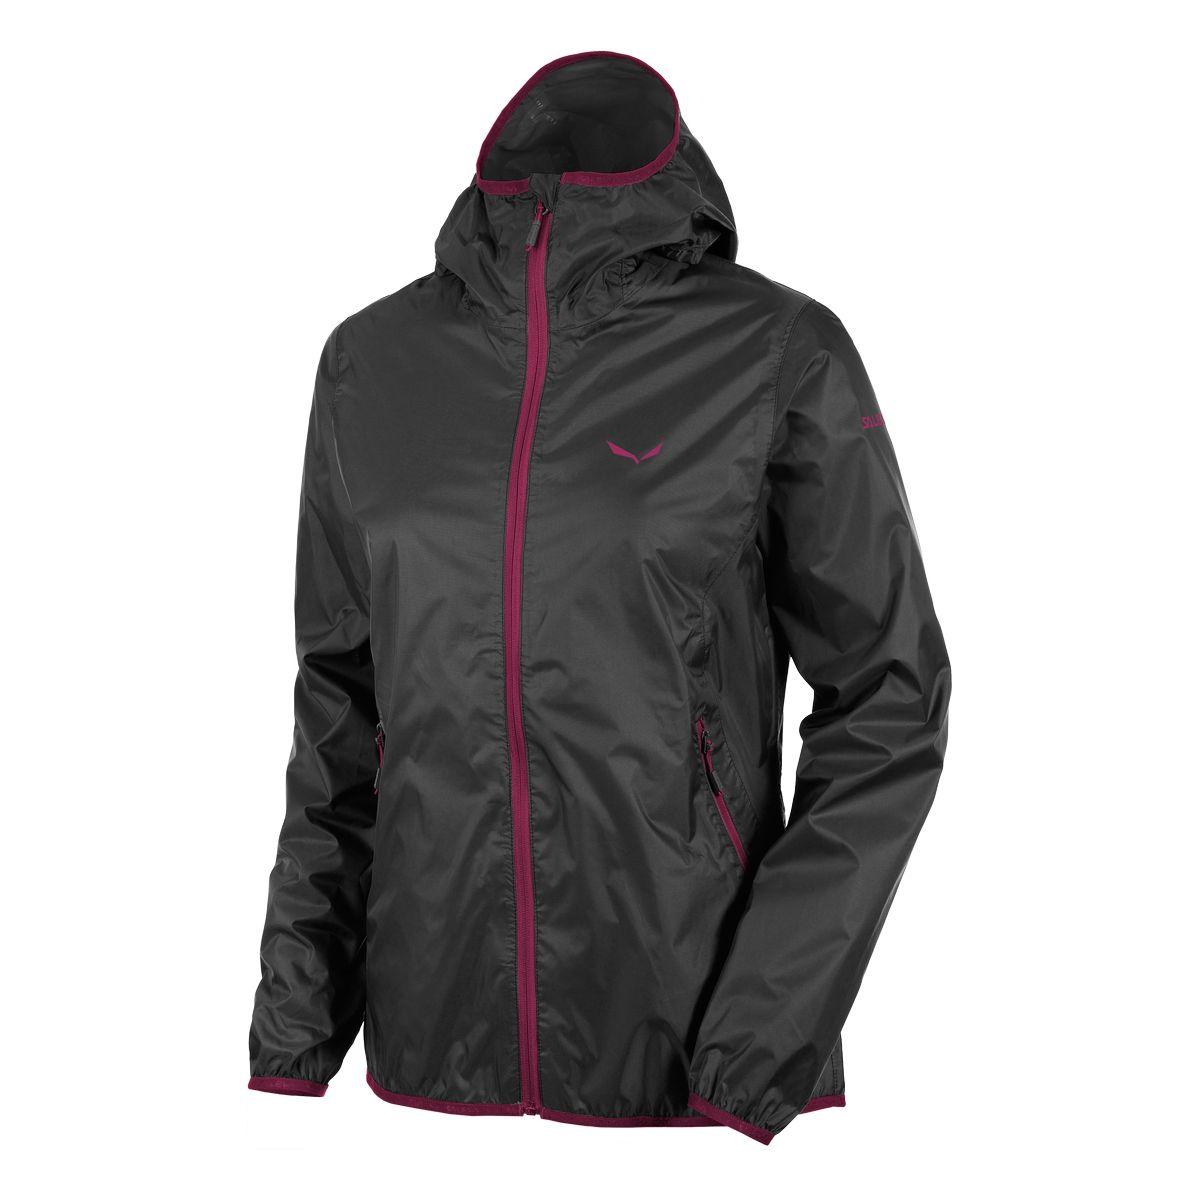 Куртка для активного отдыха Salewa 2016 PUEZ (BRAIES) RTC W JKT black out/6520